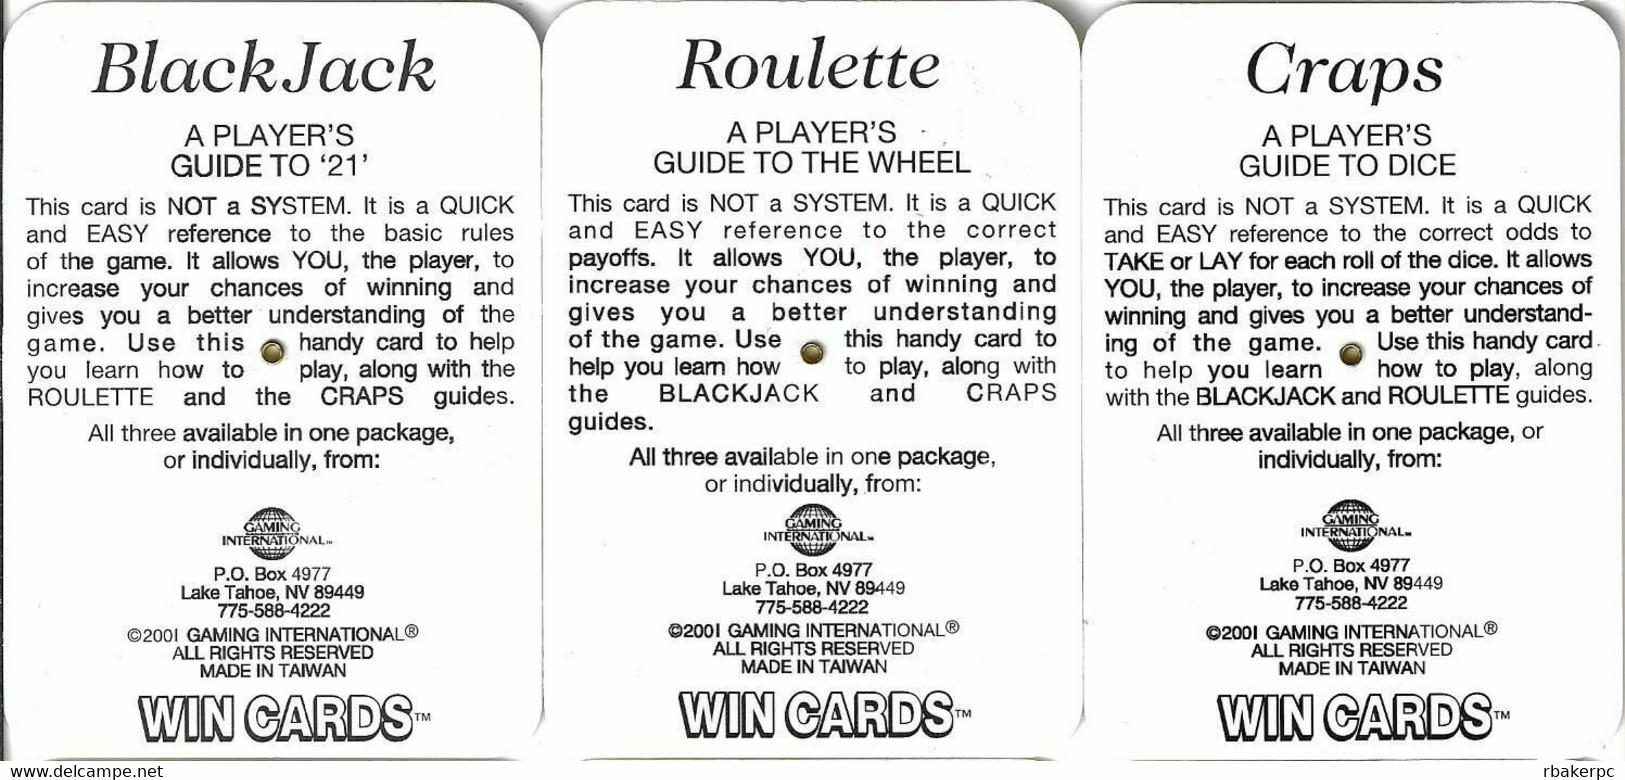 Set Of 3 Edgewater Casino WinCards (c) 2001 - Craps, Blackjack And Roulette - Casino Cards